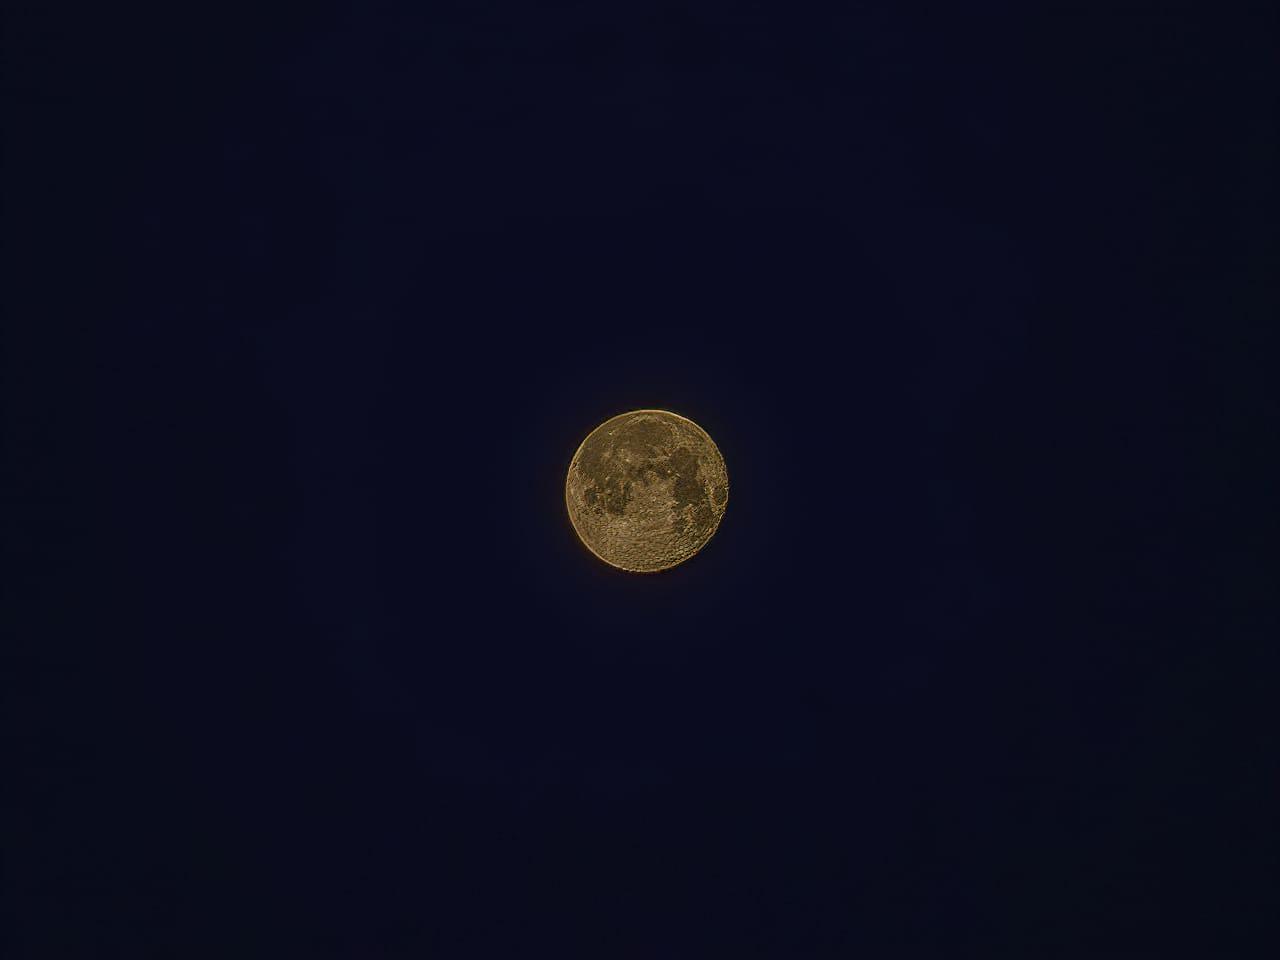 P1000 Lunar Photography 500mm Jeff Wendorff